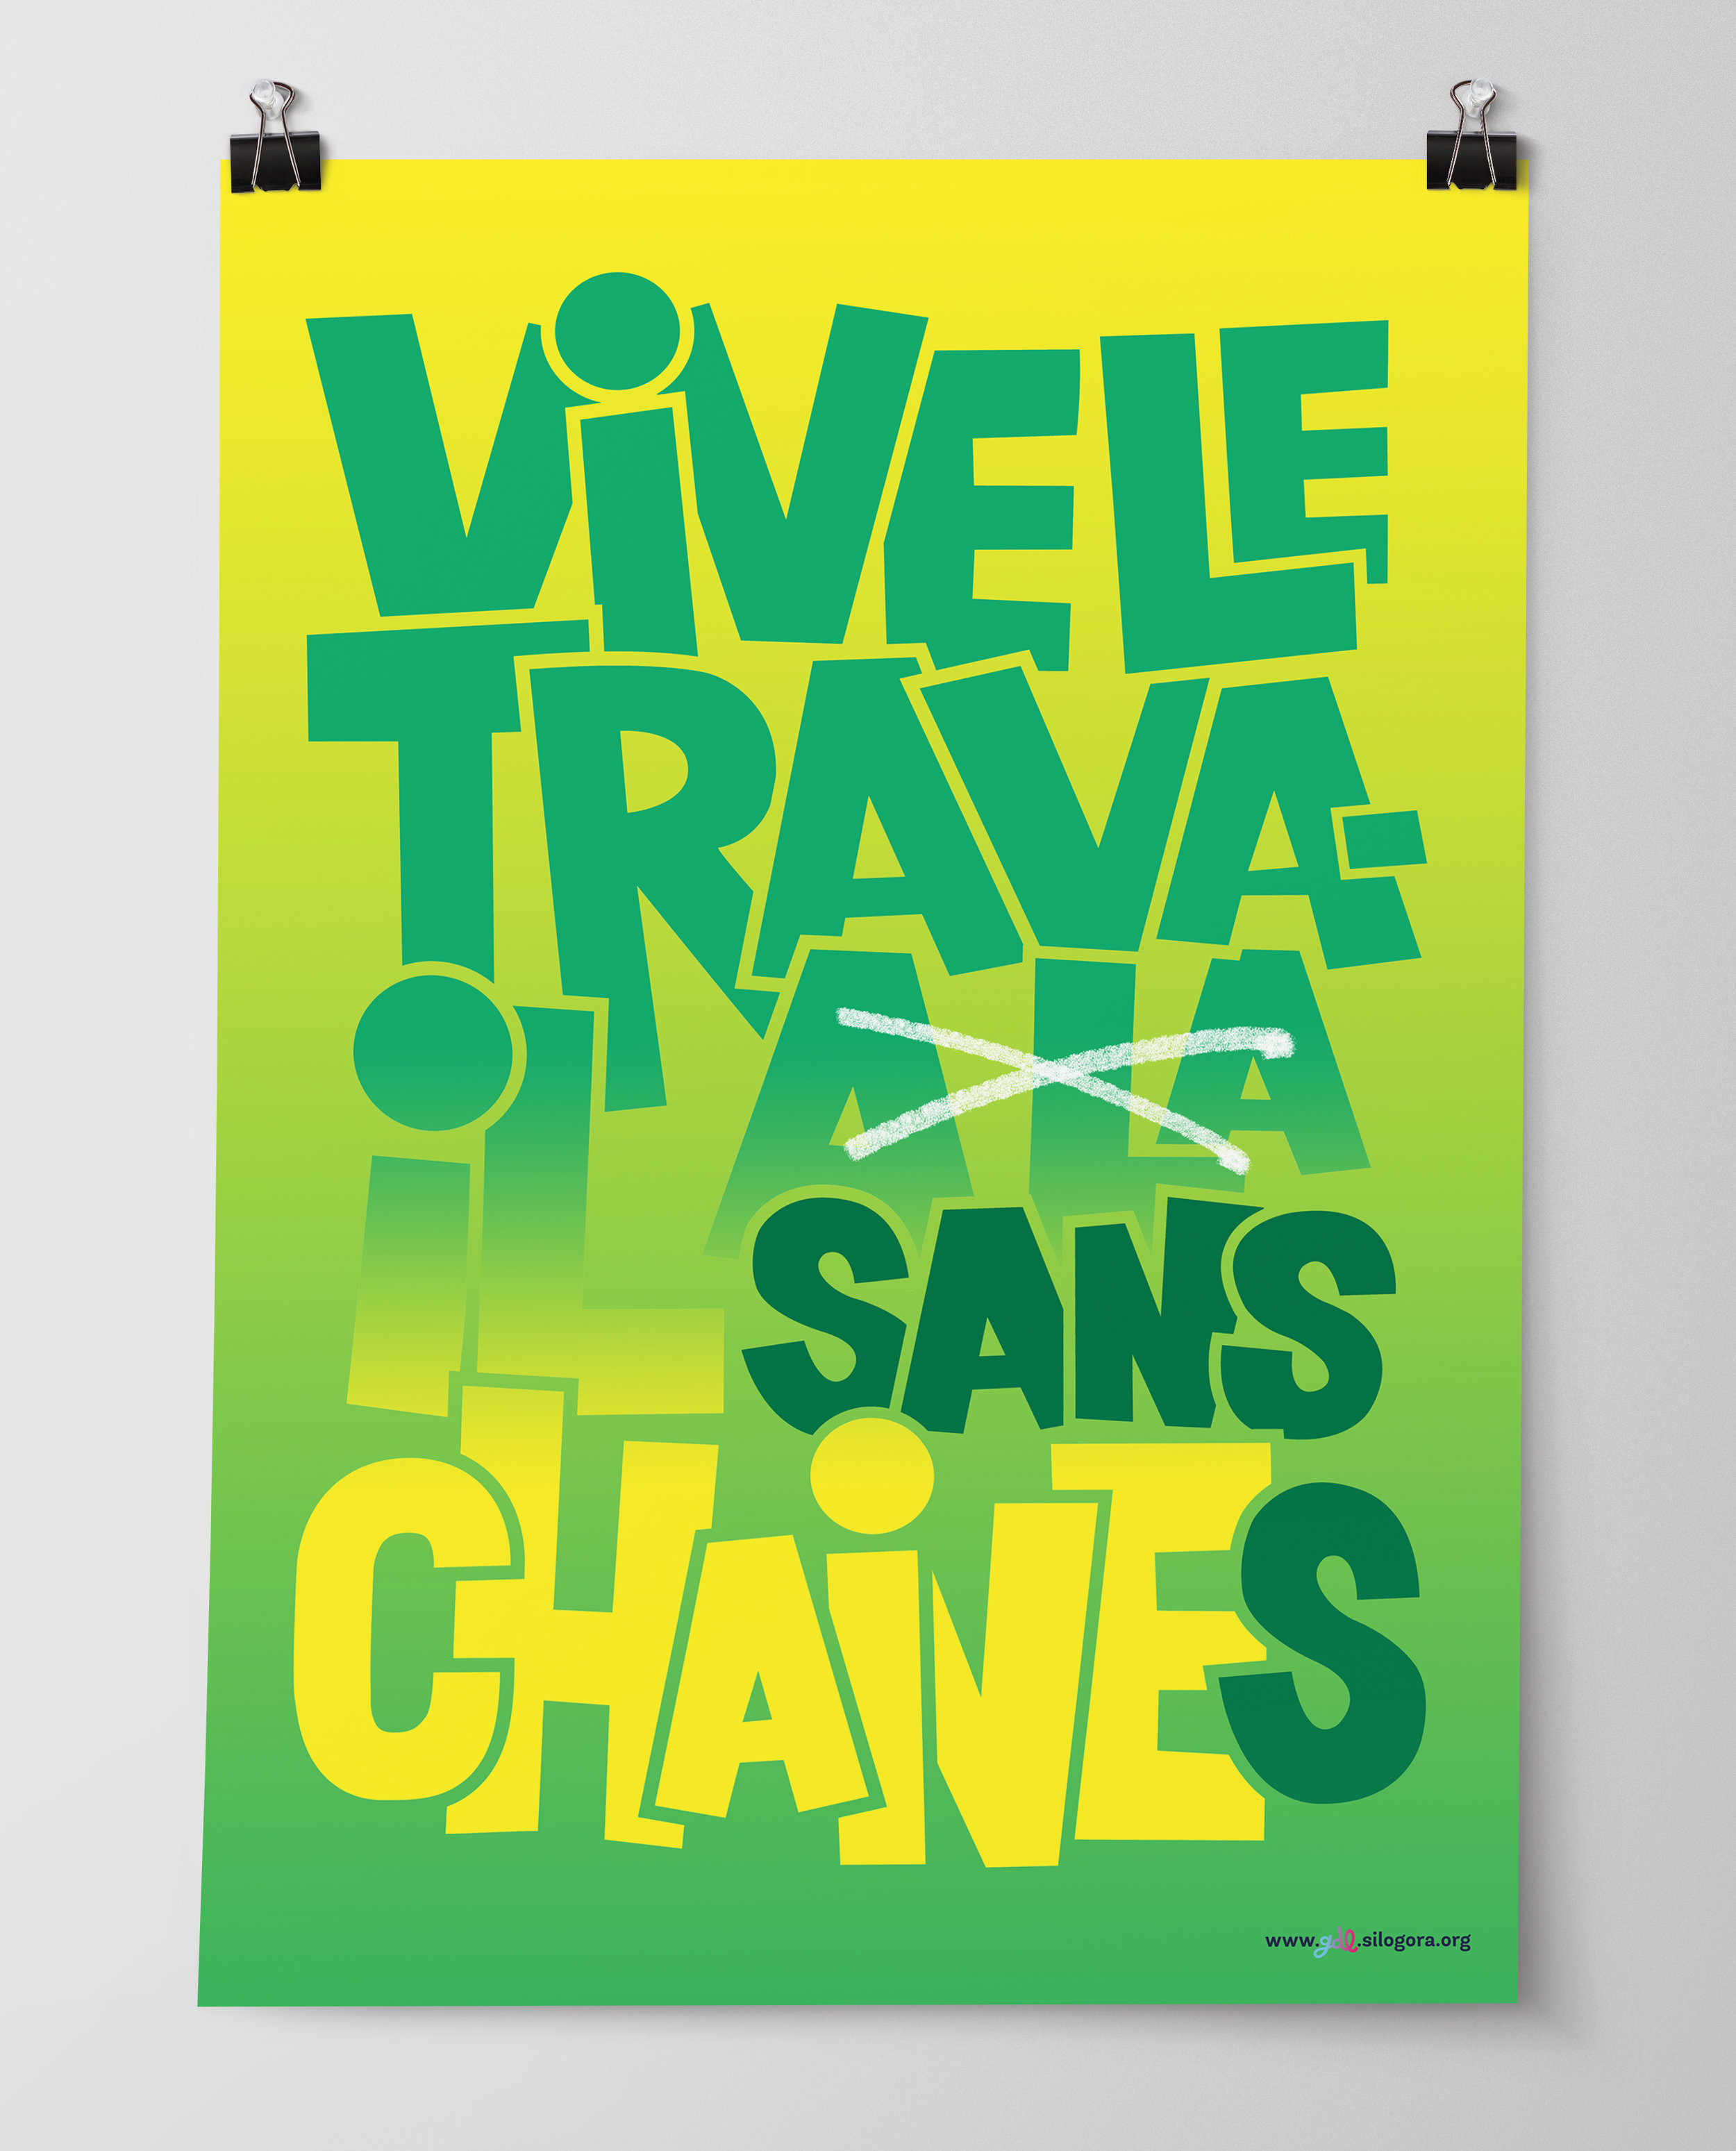 grand-débat-large-poster-yellow-pabloka-chispa.jpg